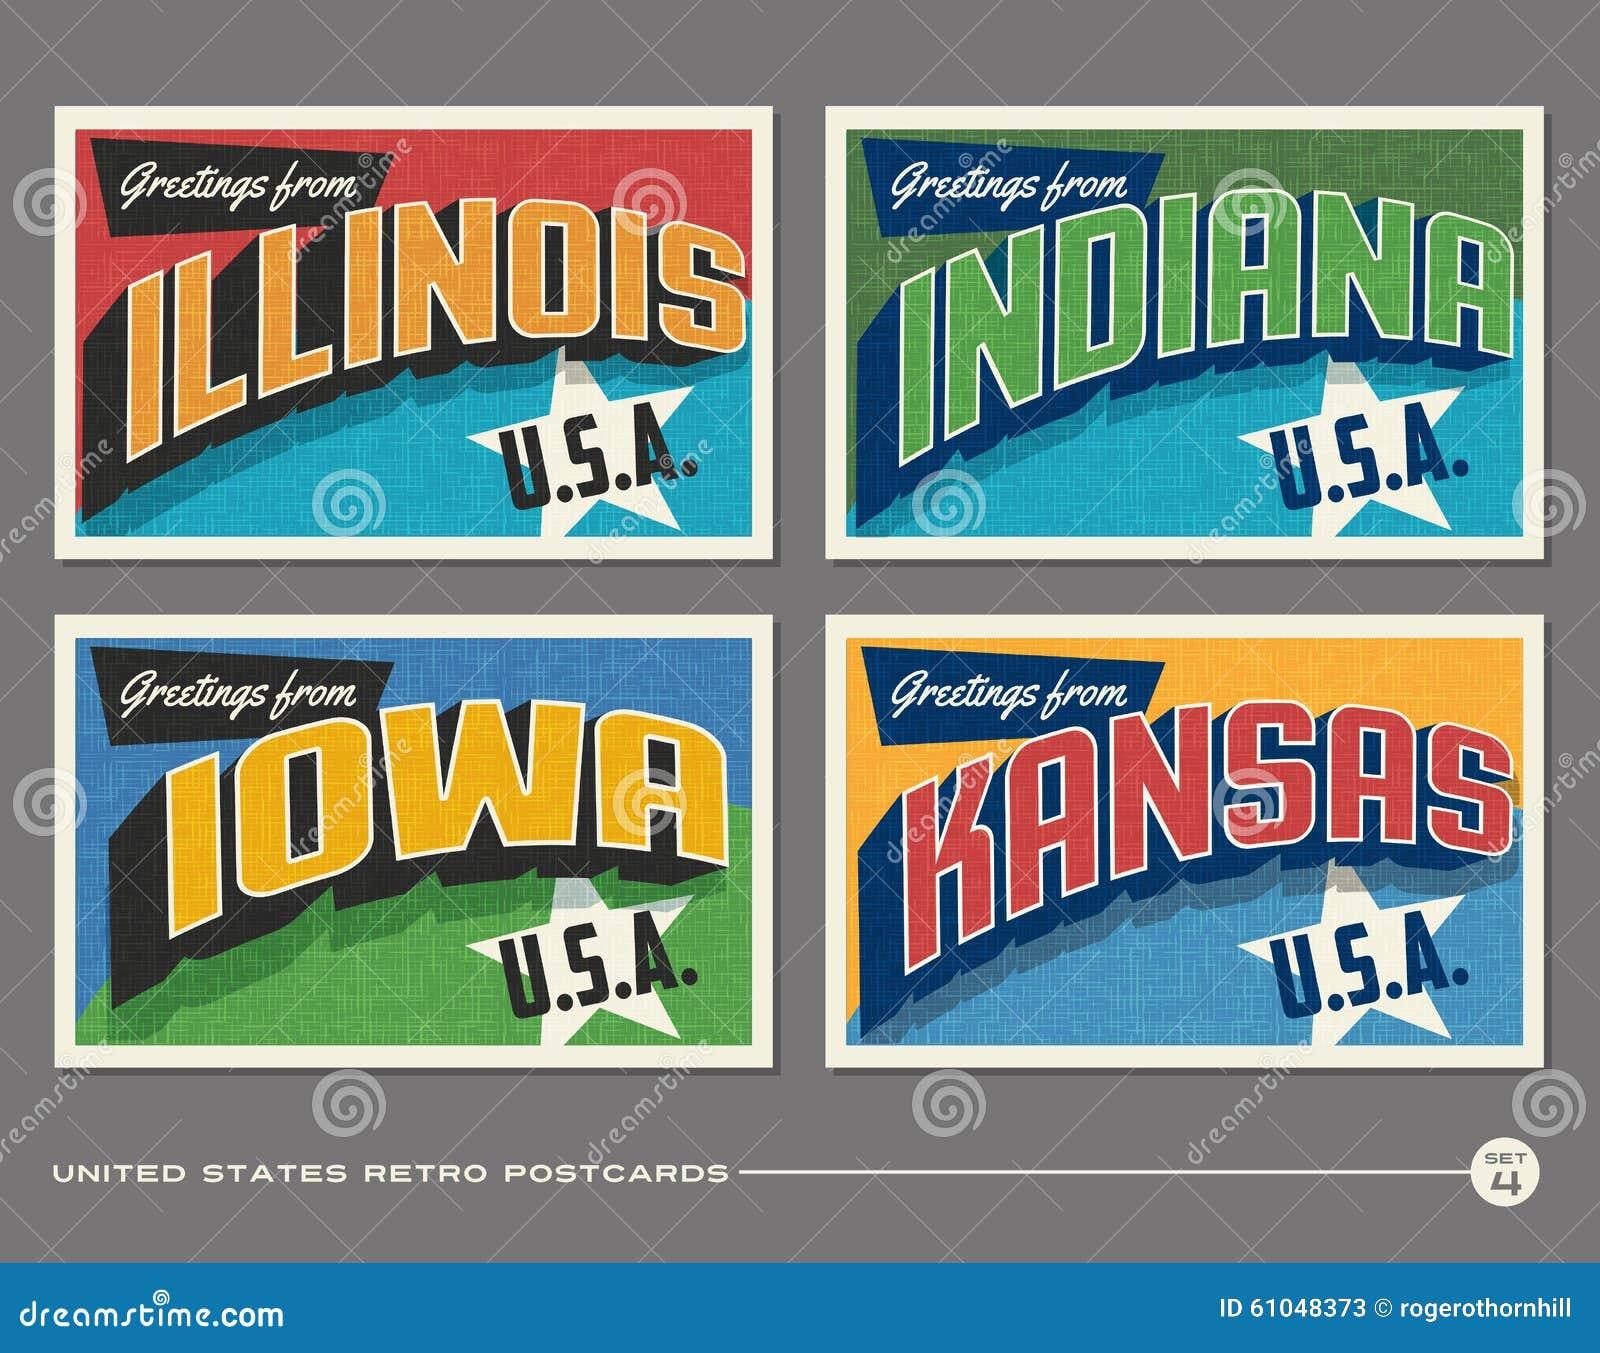 United states vintage typography postcards stock vector download united states vintage typography postcards stock vector illustration of greeting font 61048373 m4hsunfo